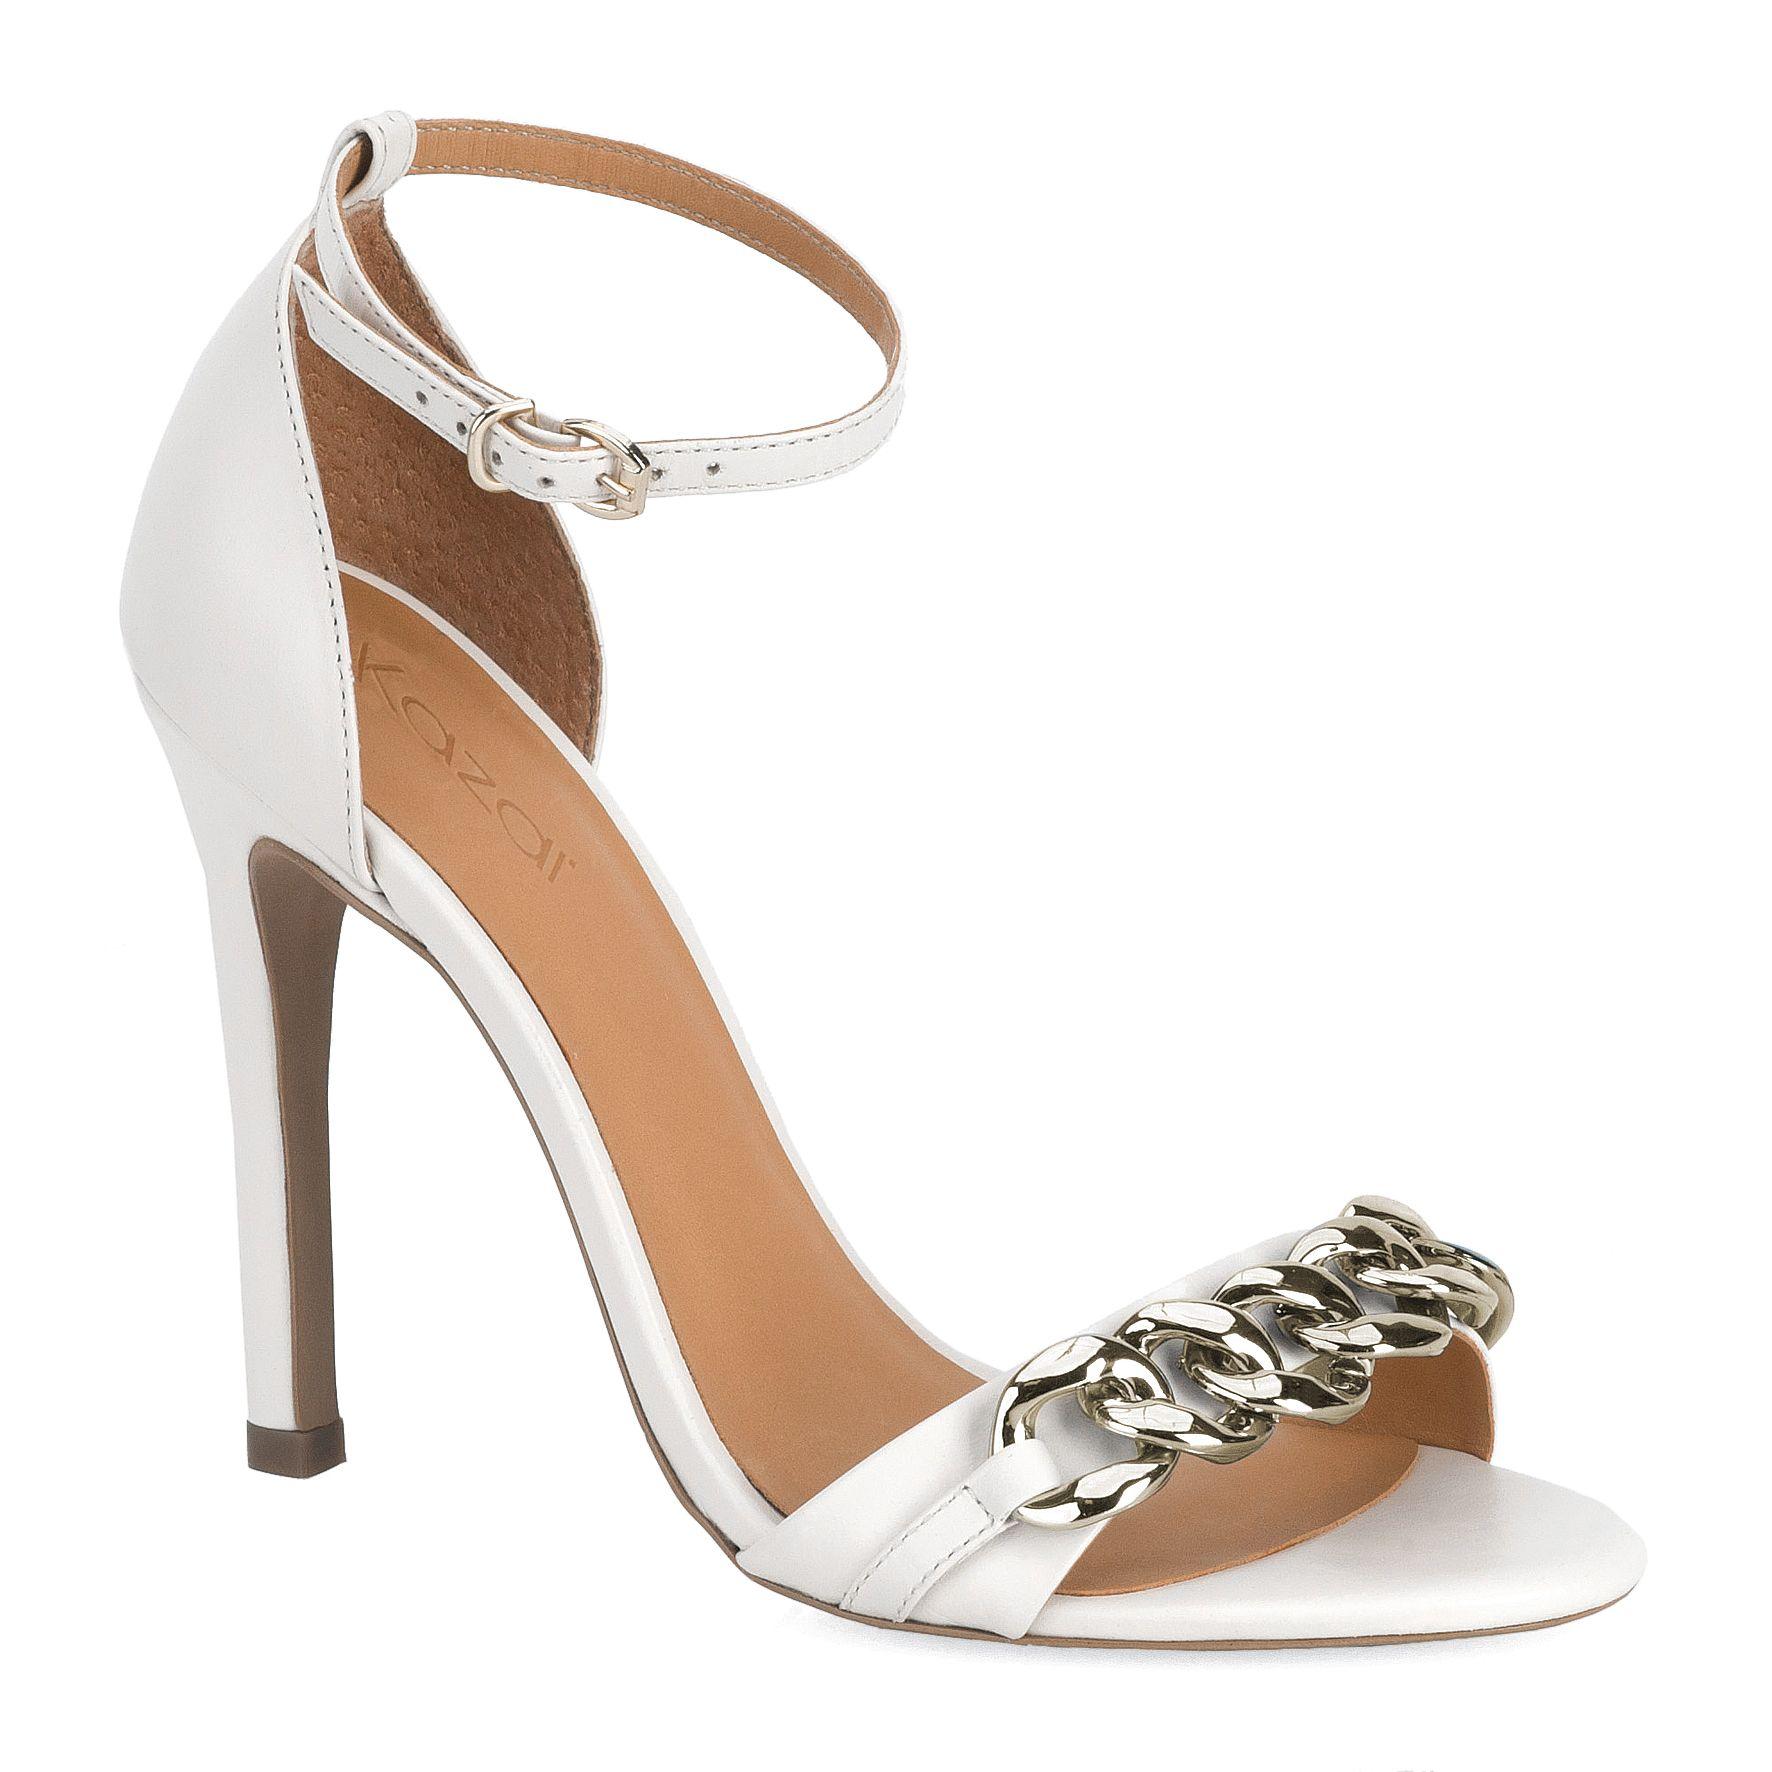 54022f01f70022 #Kazar trends www.kazar.com #kazar #fashion #boots #shoes #heels #szpilki  #white